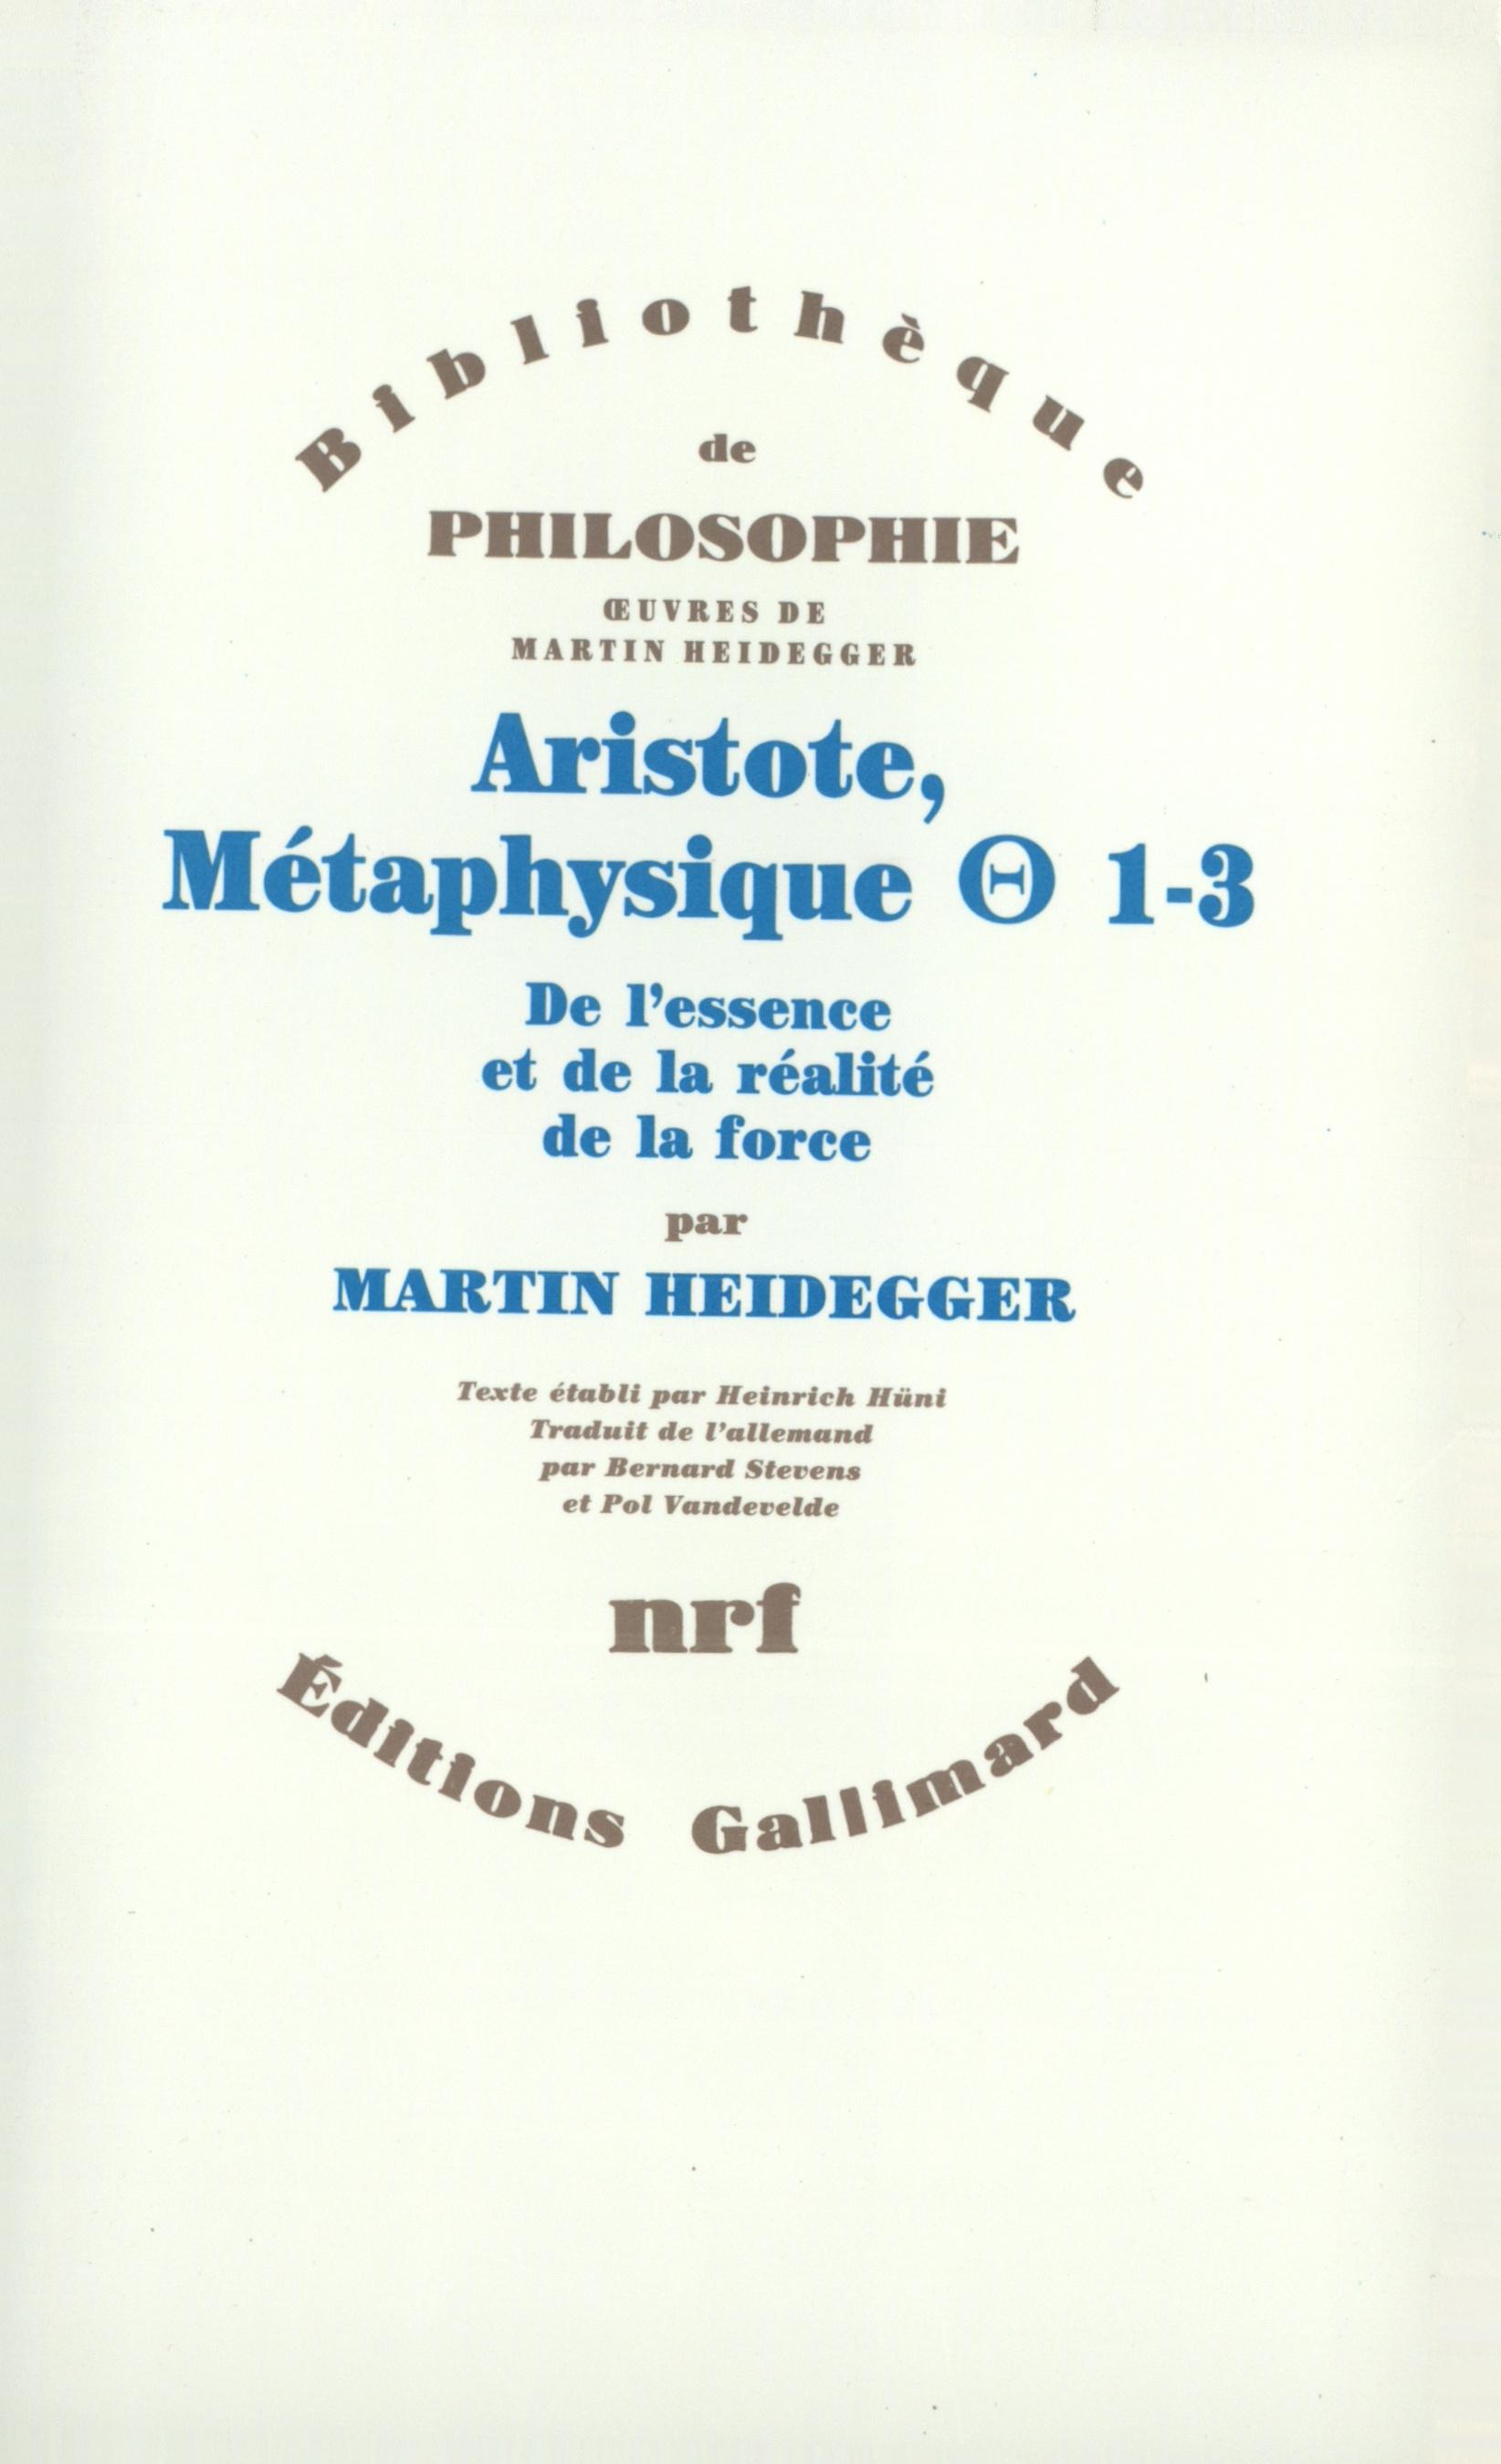 ARISTOTE, METAPHYSIQUE [THETA] 1-3